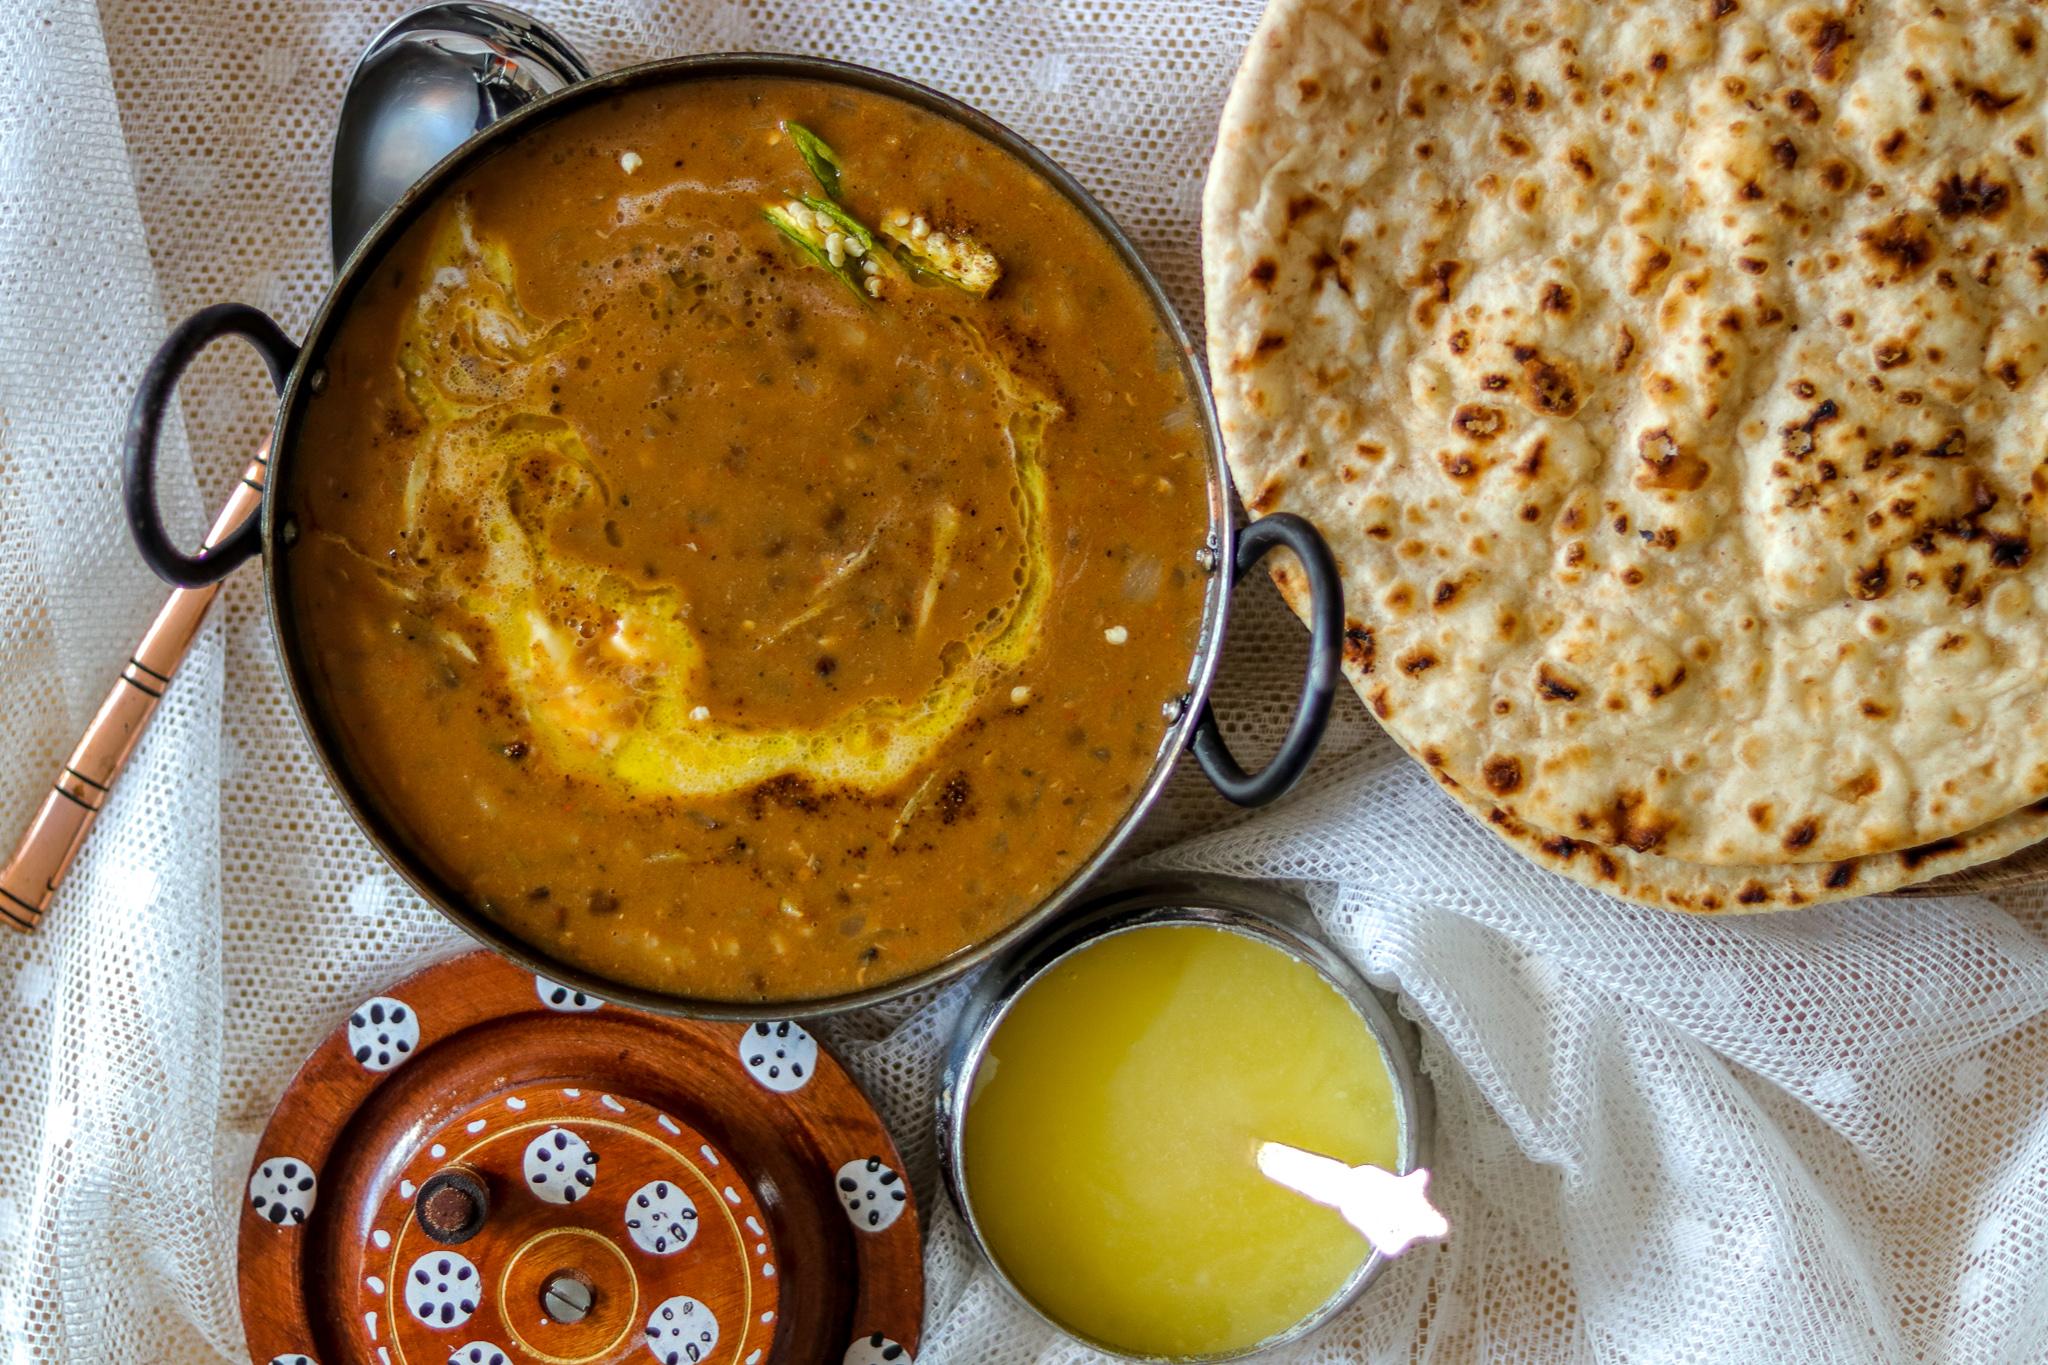 Maa ki dal/ Kaali Dal/ Whole urad lentils